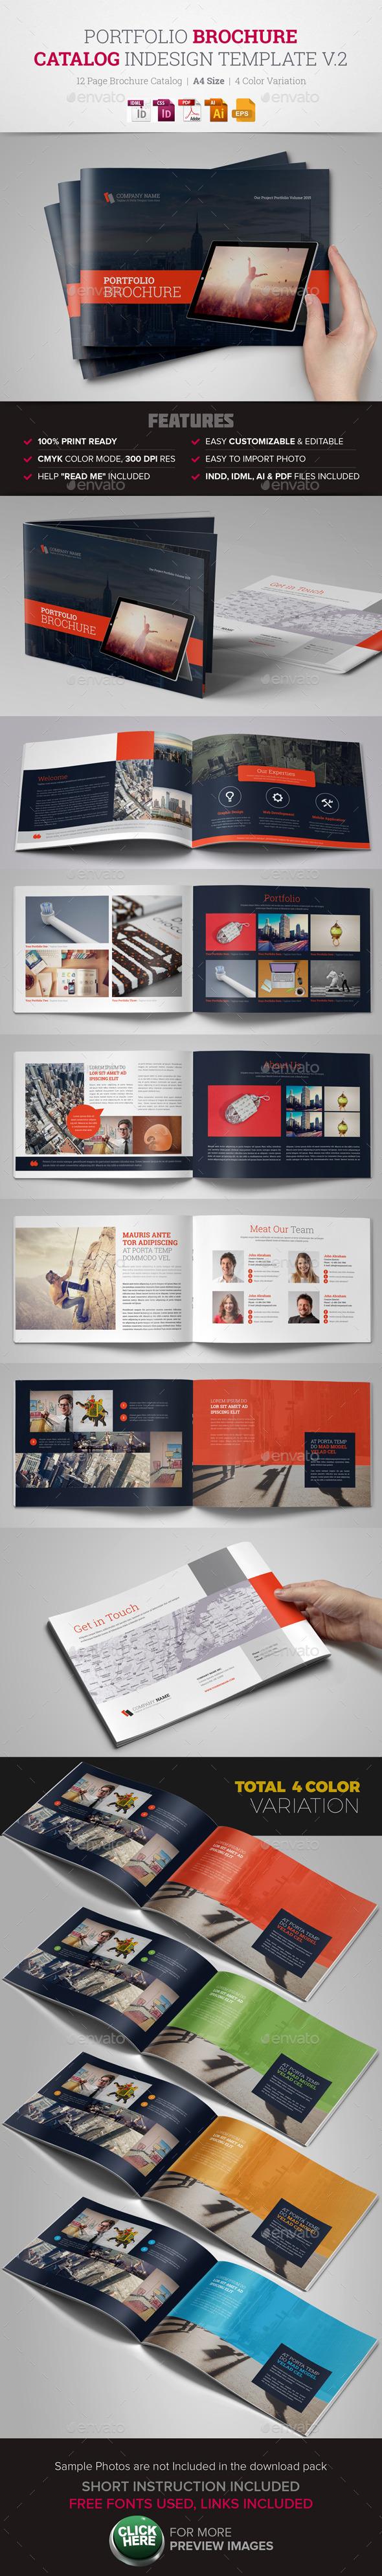 Portfolio Brochure InDesign Template v2 - Corporate Brochures